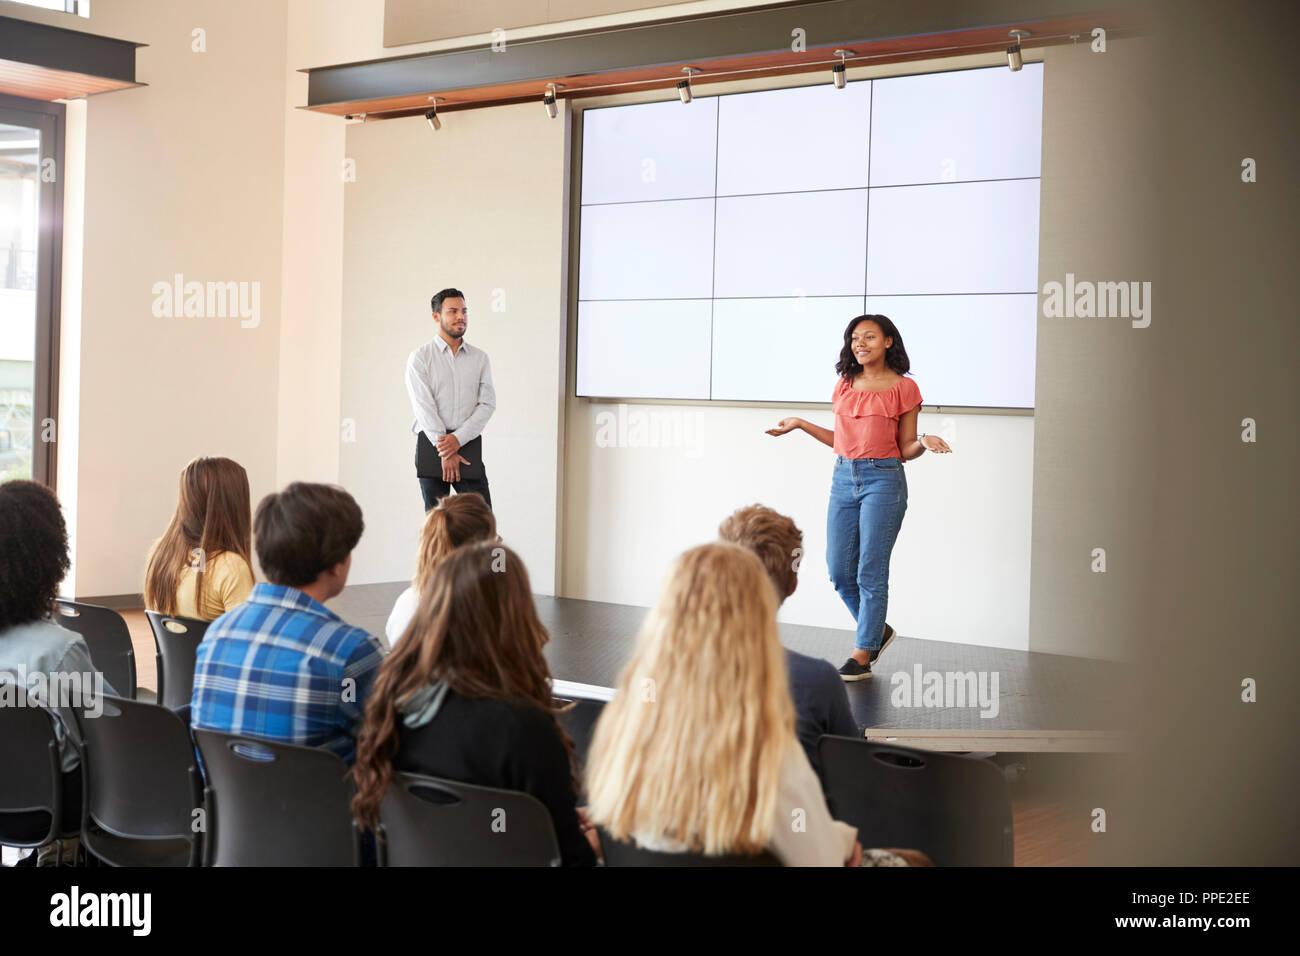 Female Student Giving Presentation de High School Class en face de l'écran Banque D'Images